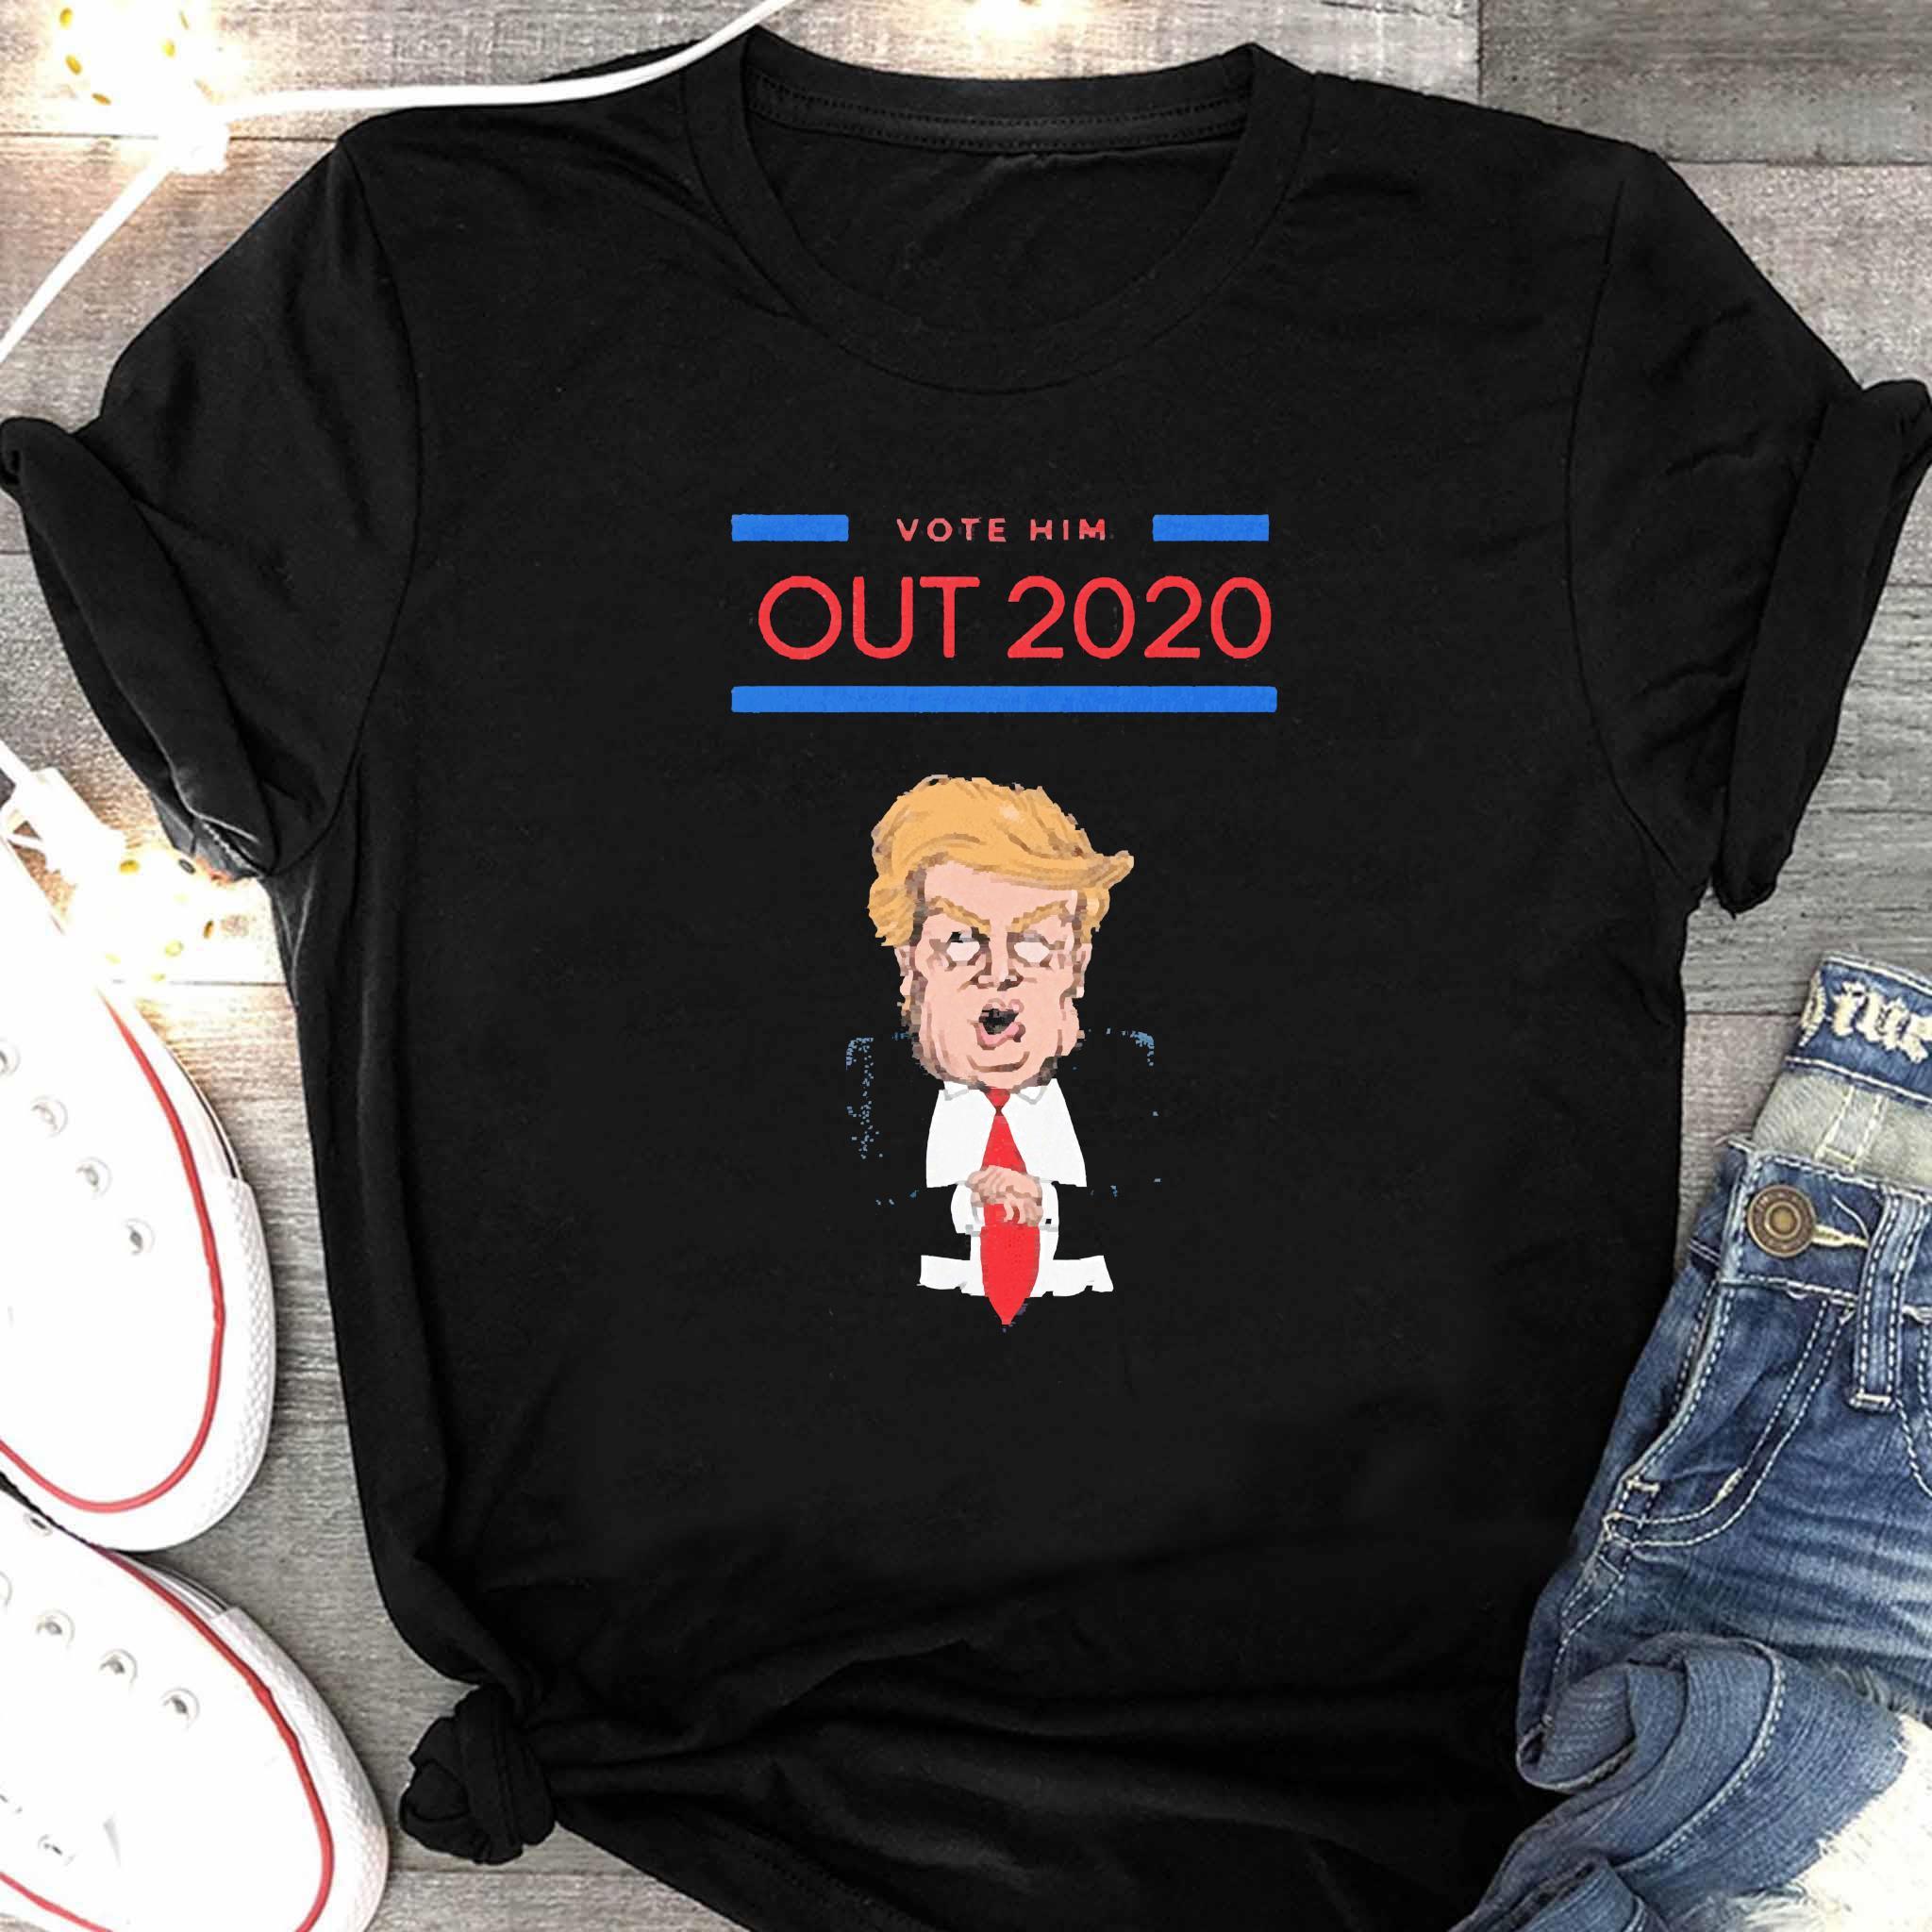 Vote Him Out 2020 Donald Trump Shirt Women's Shirt